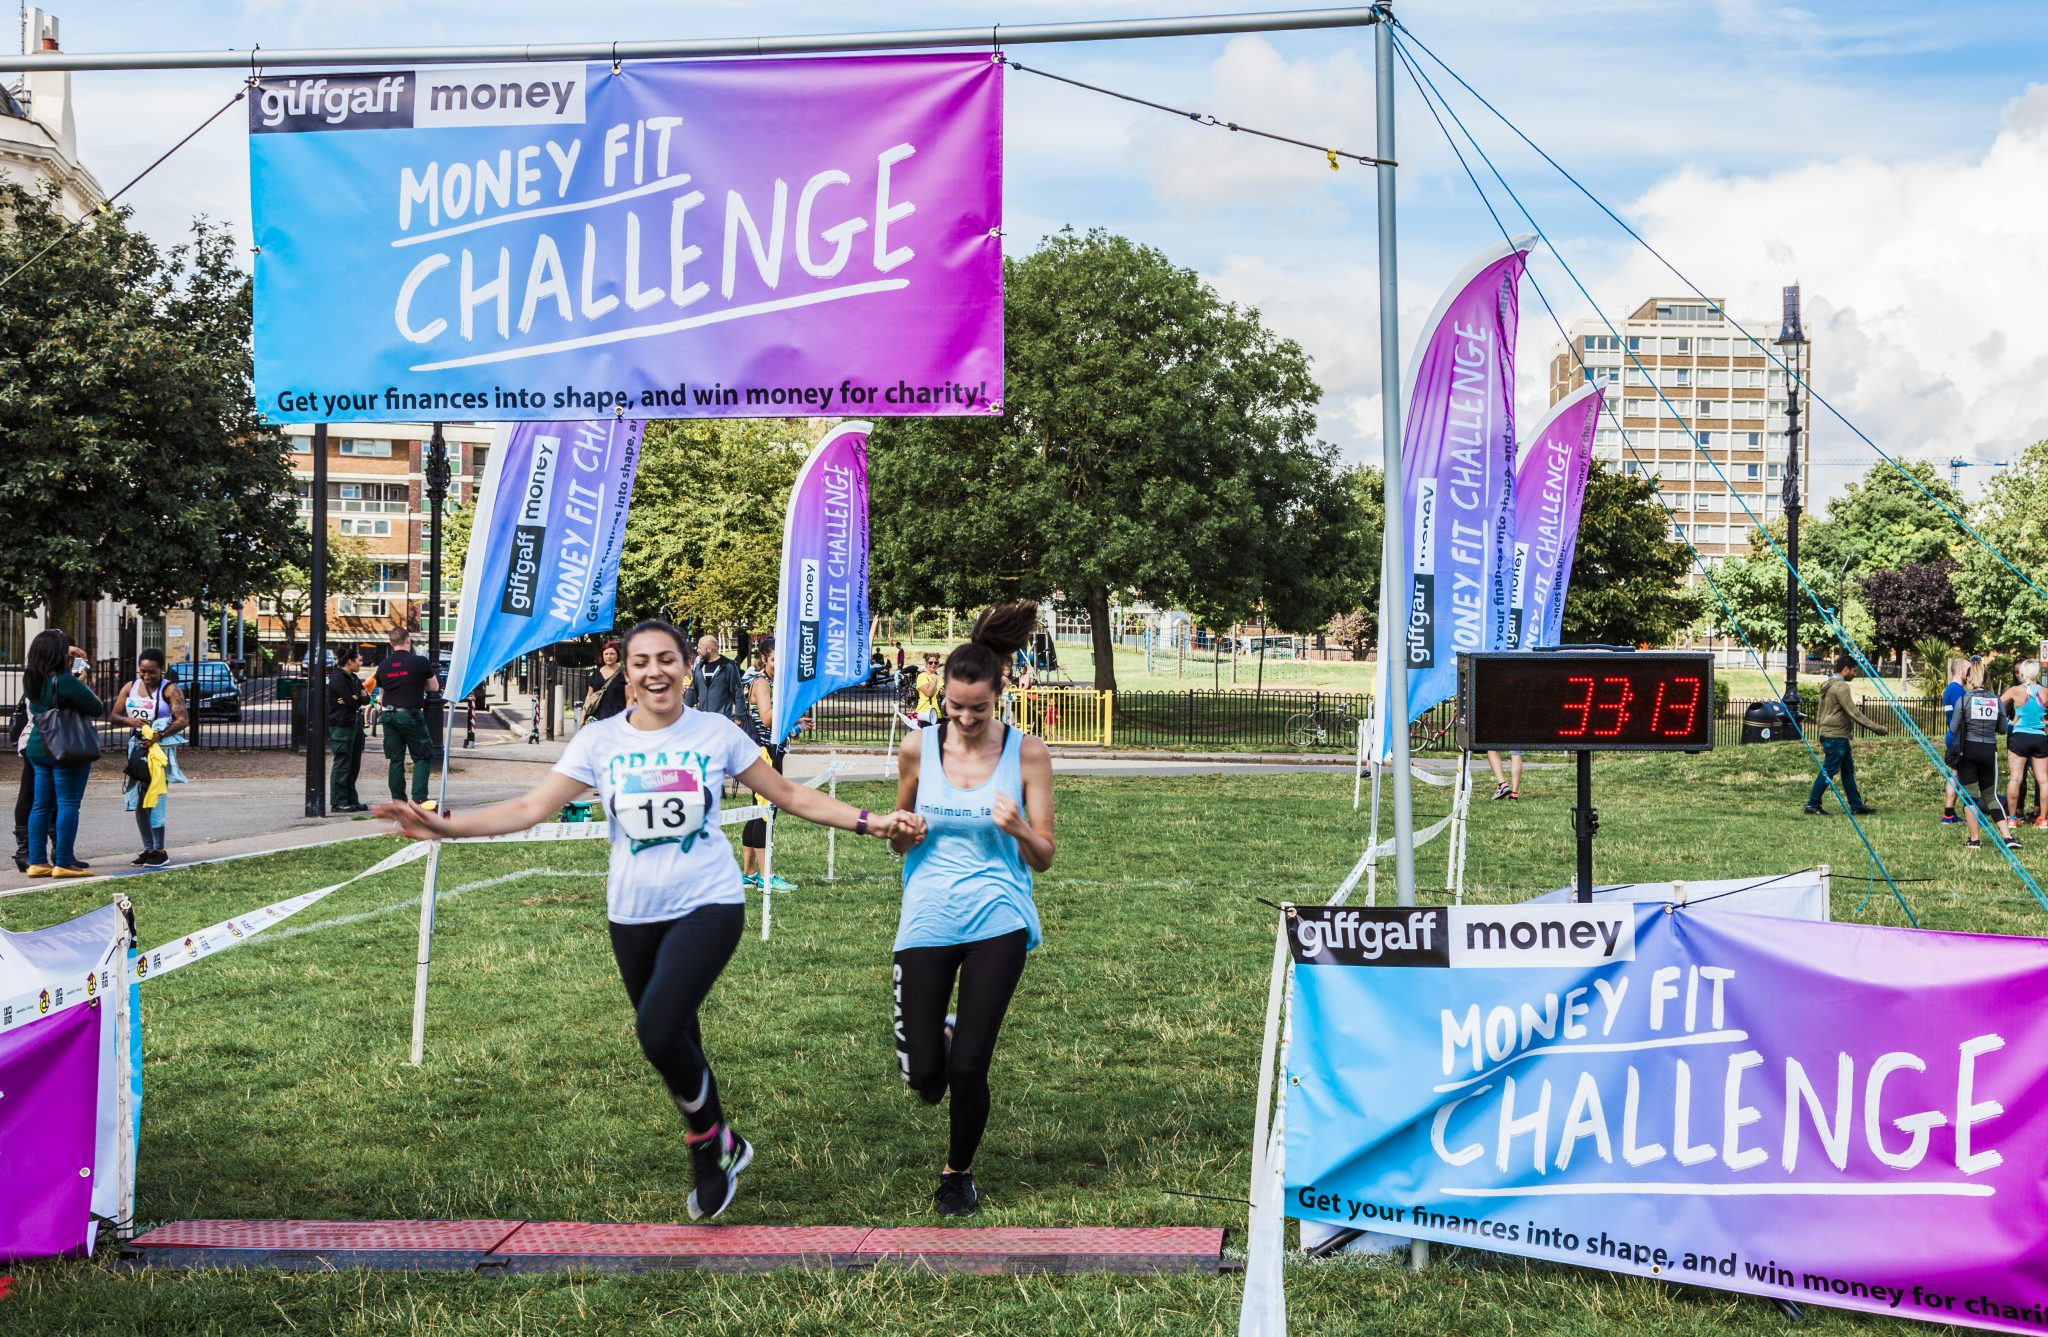 0081 Finish Line - Giff Gaff Money Fit Challenge